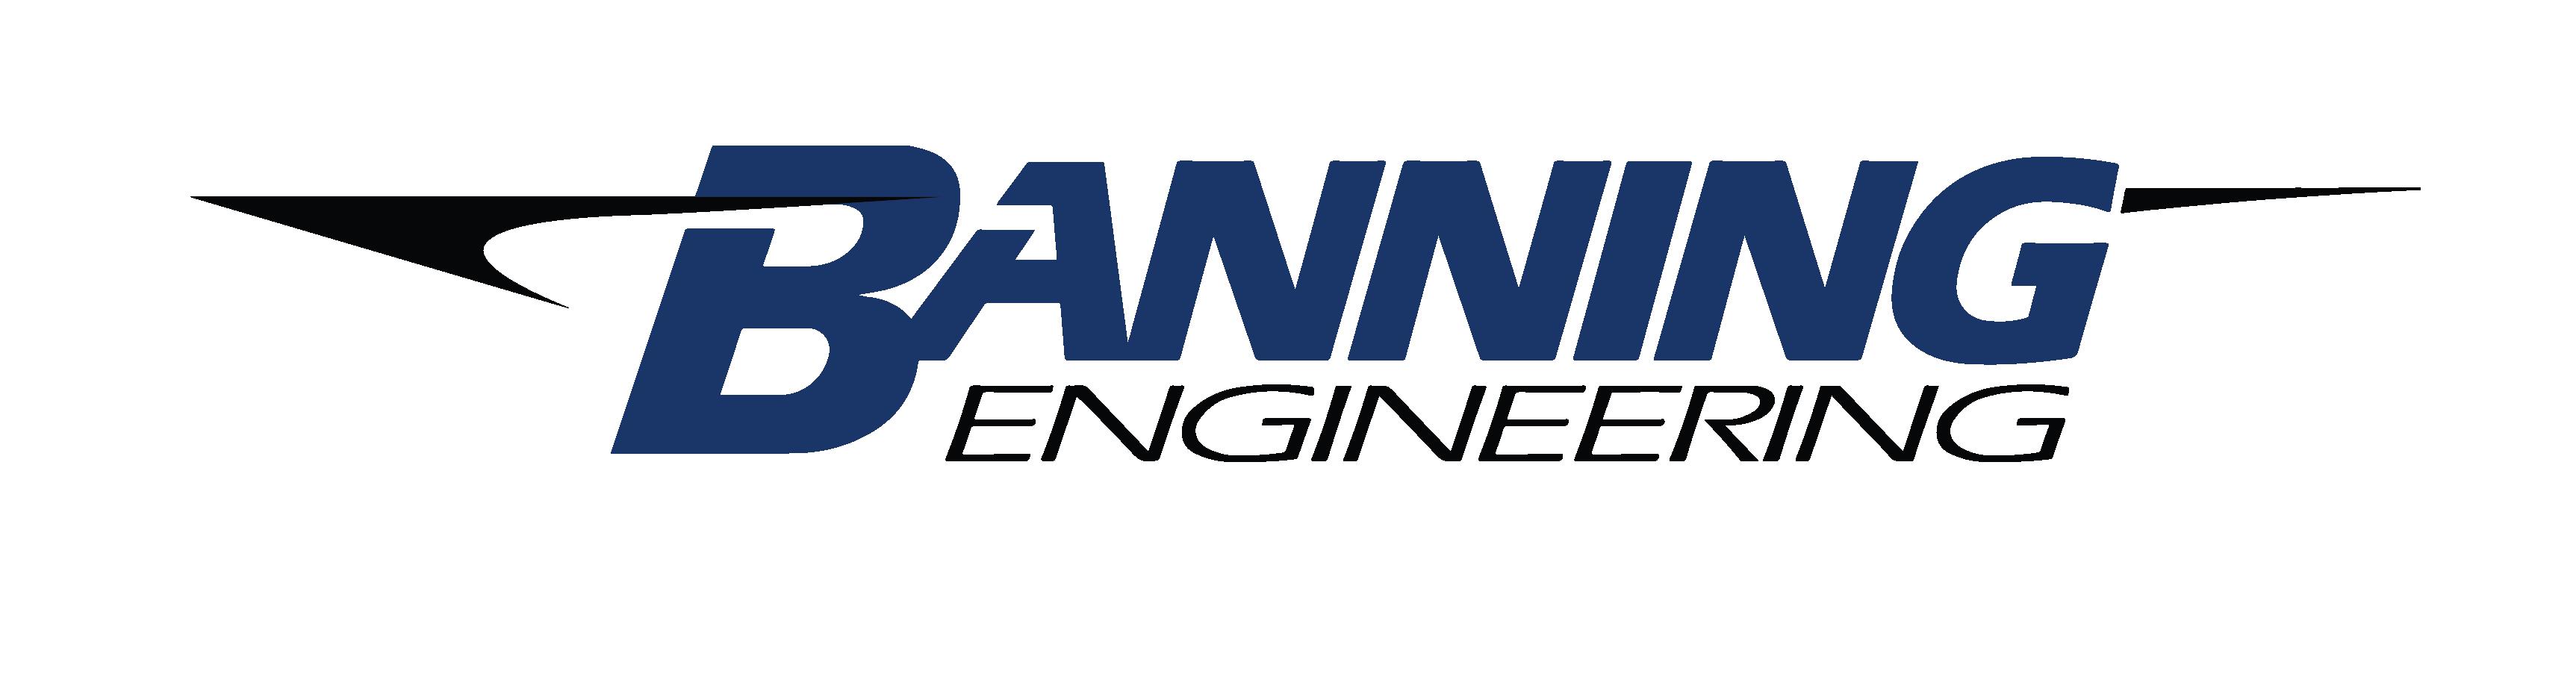 Banning Engineering